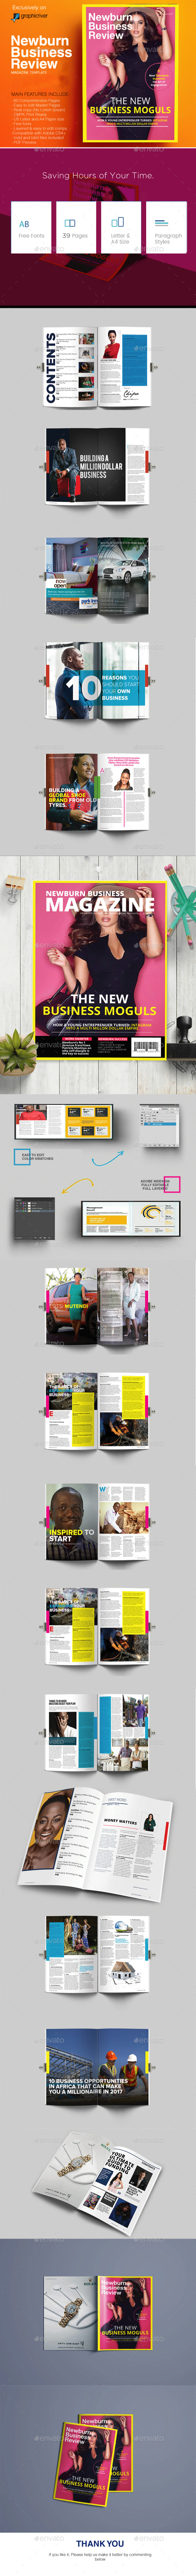 Newburn Business Review Magazine Design Template - Magazines Print Templates